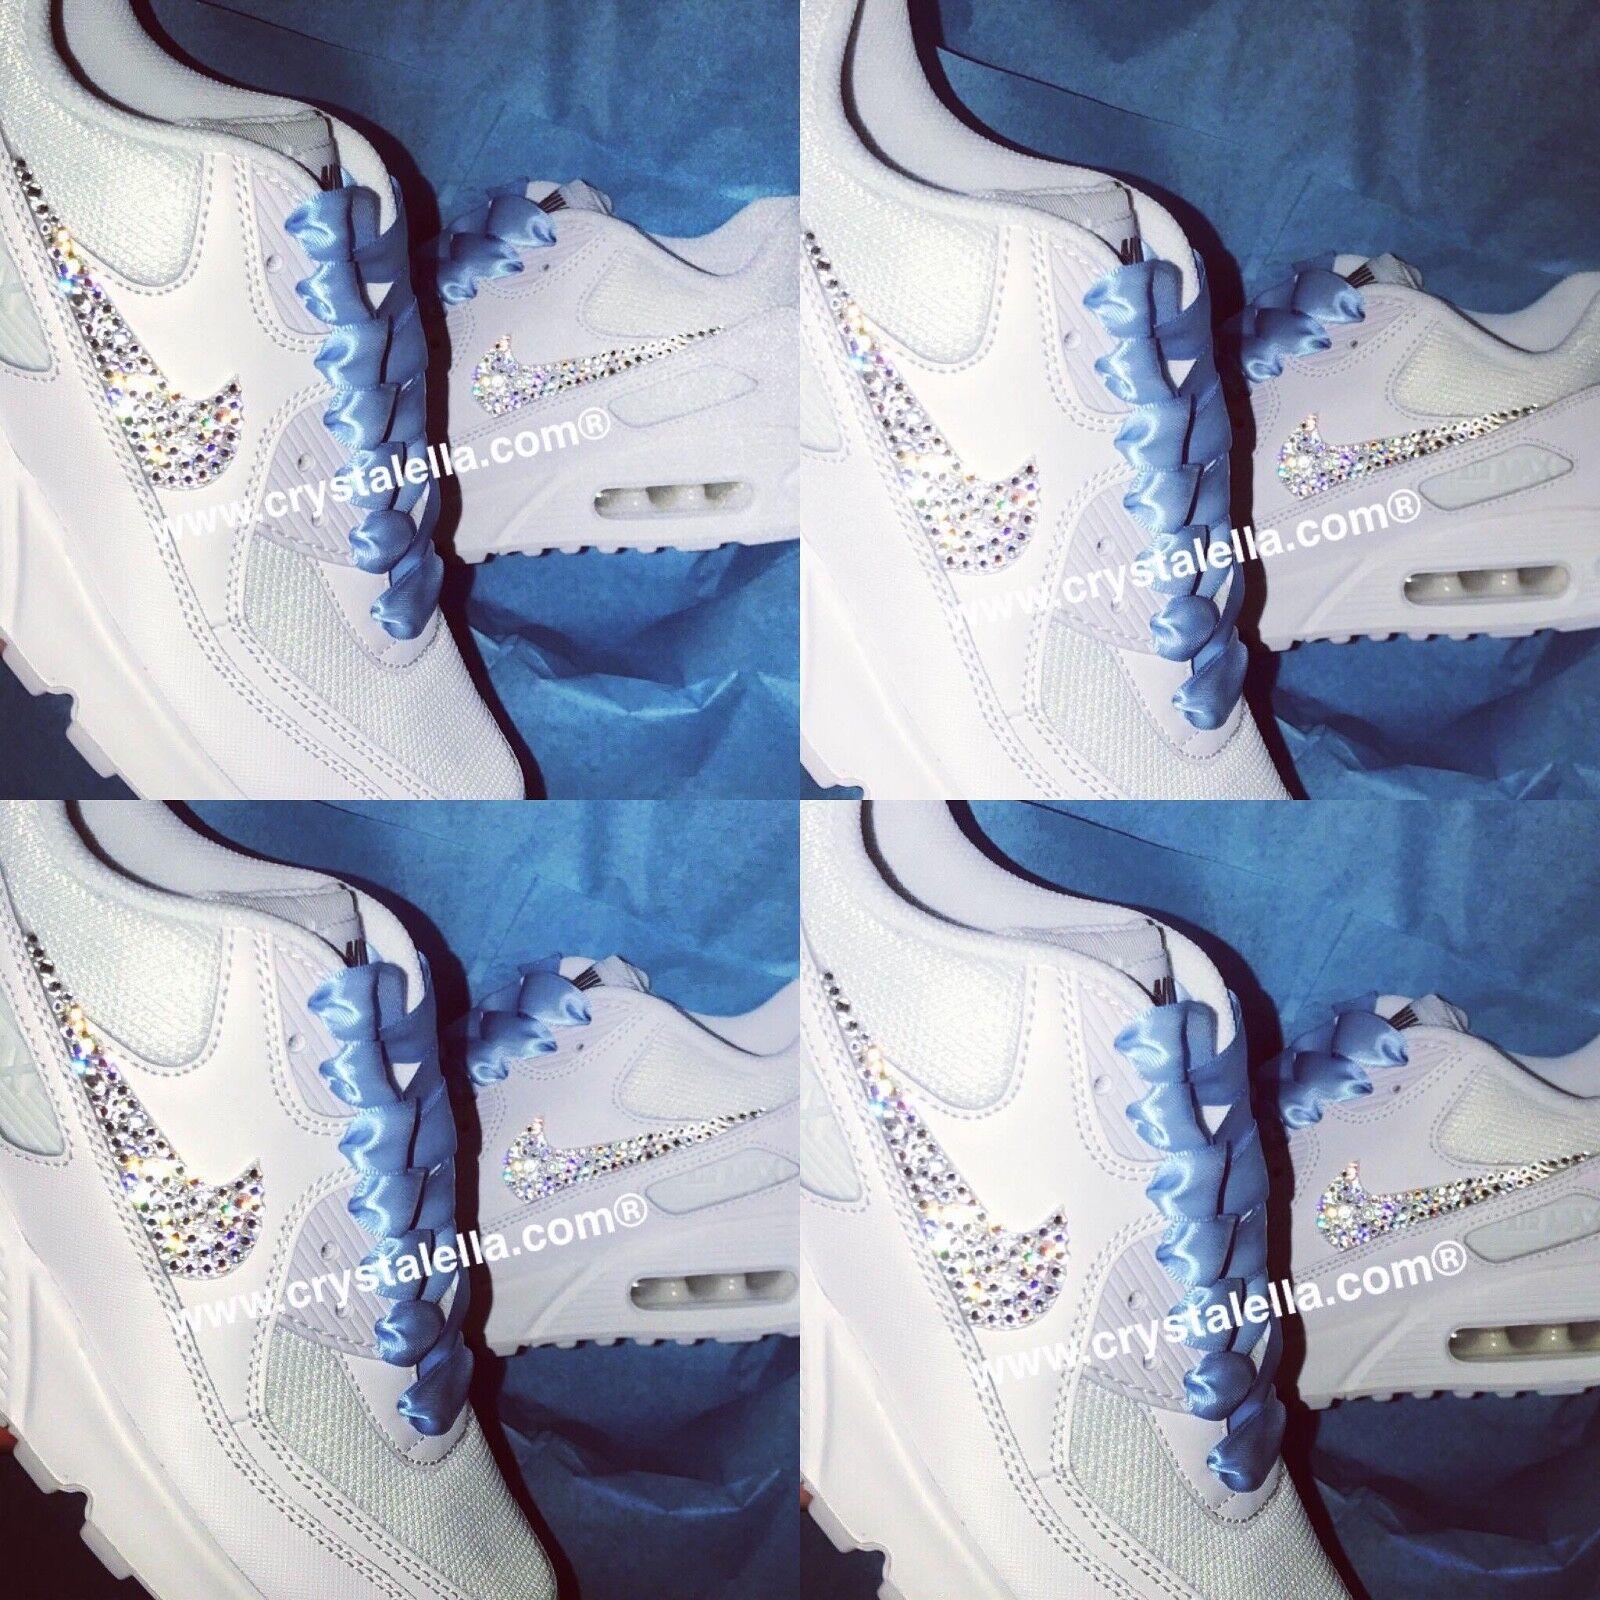 Nikes 'Something Bleu' Wedding Nike custom made Swarovski blanc Nike Wedding Air Max 90 373fef